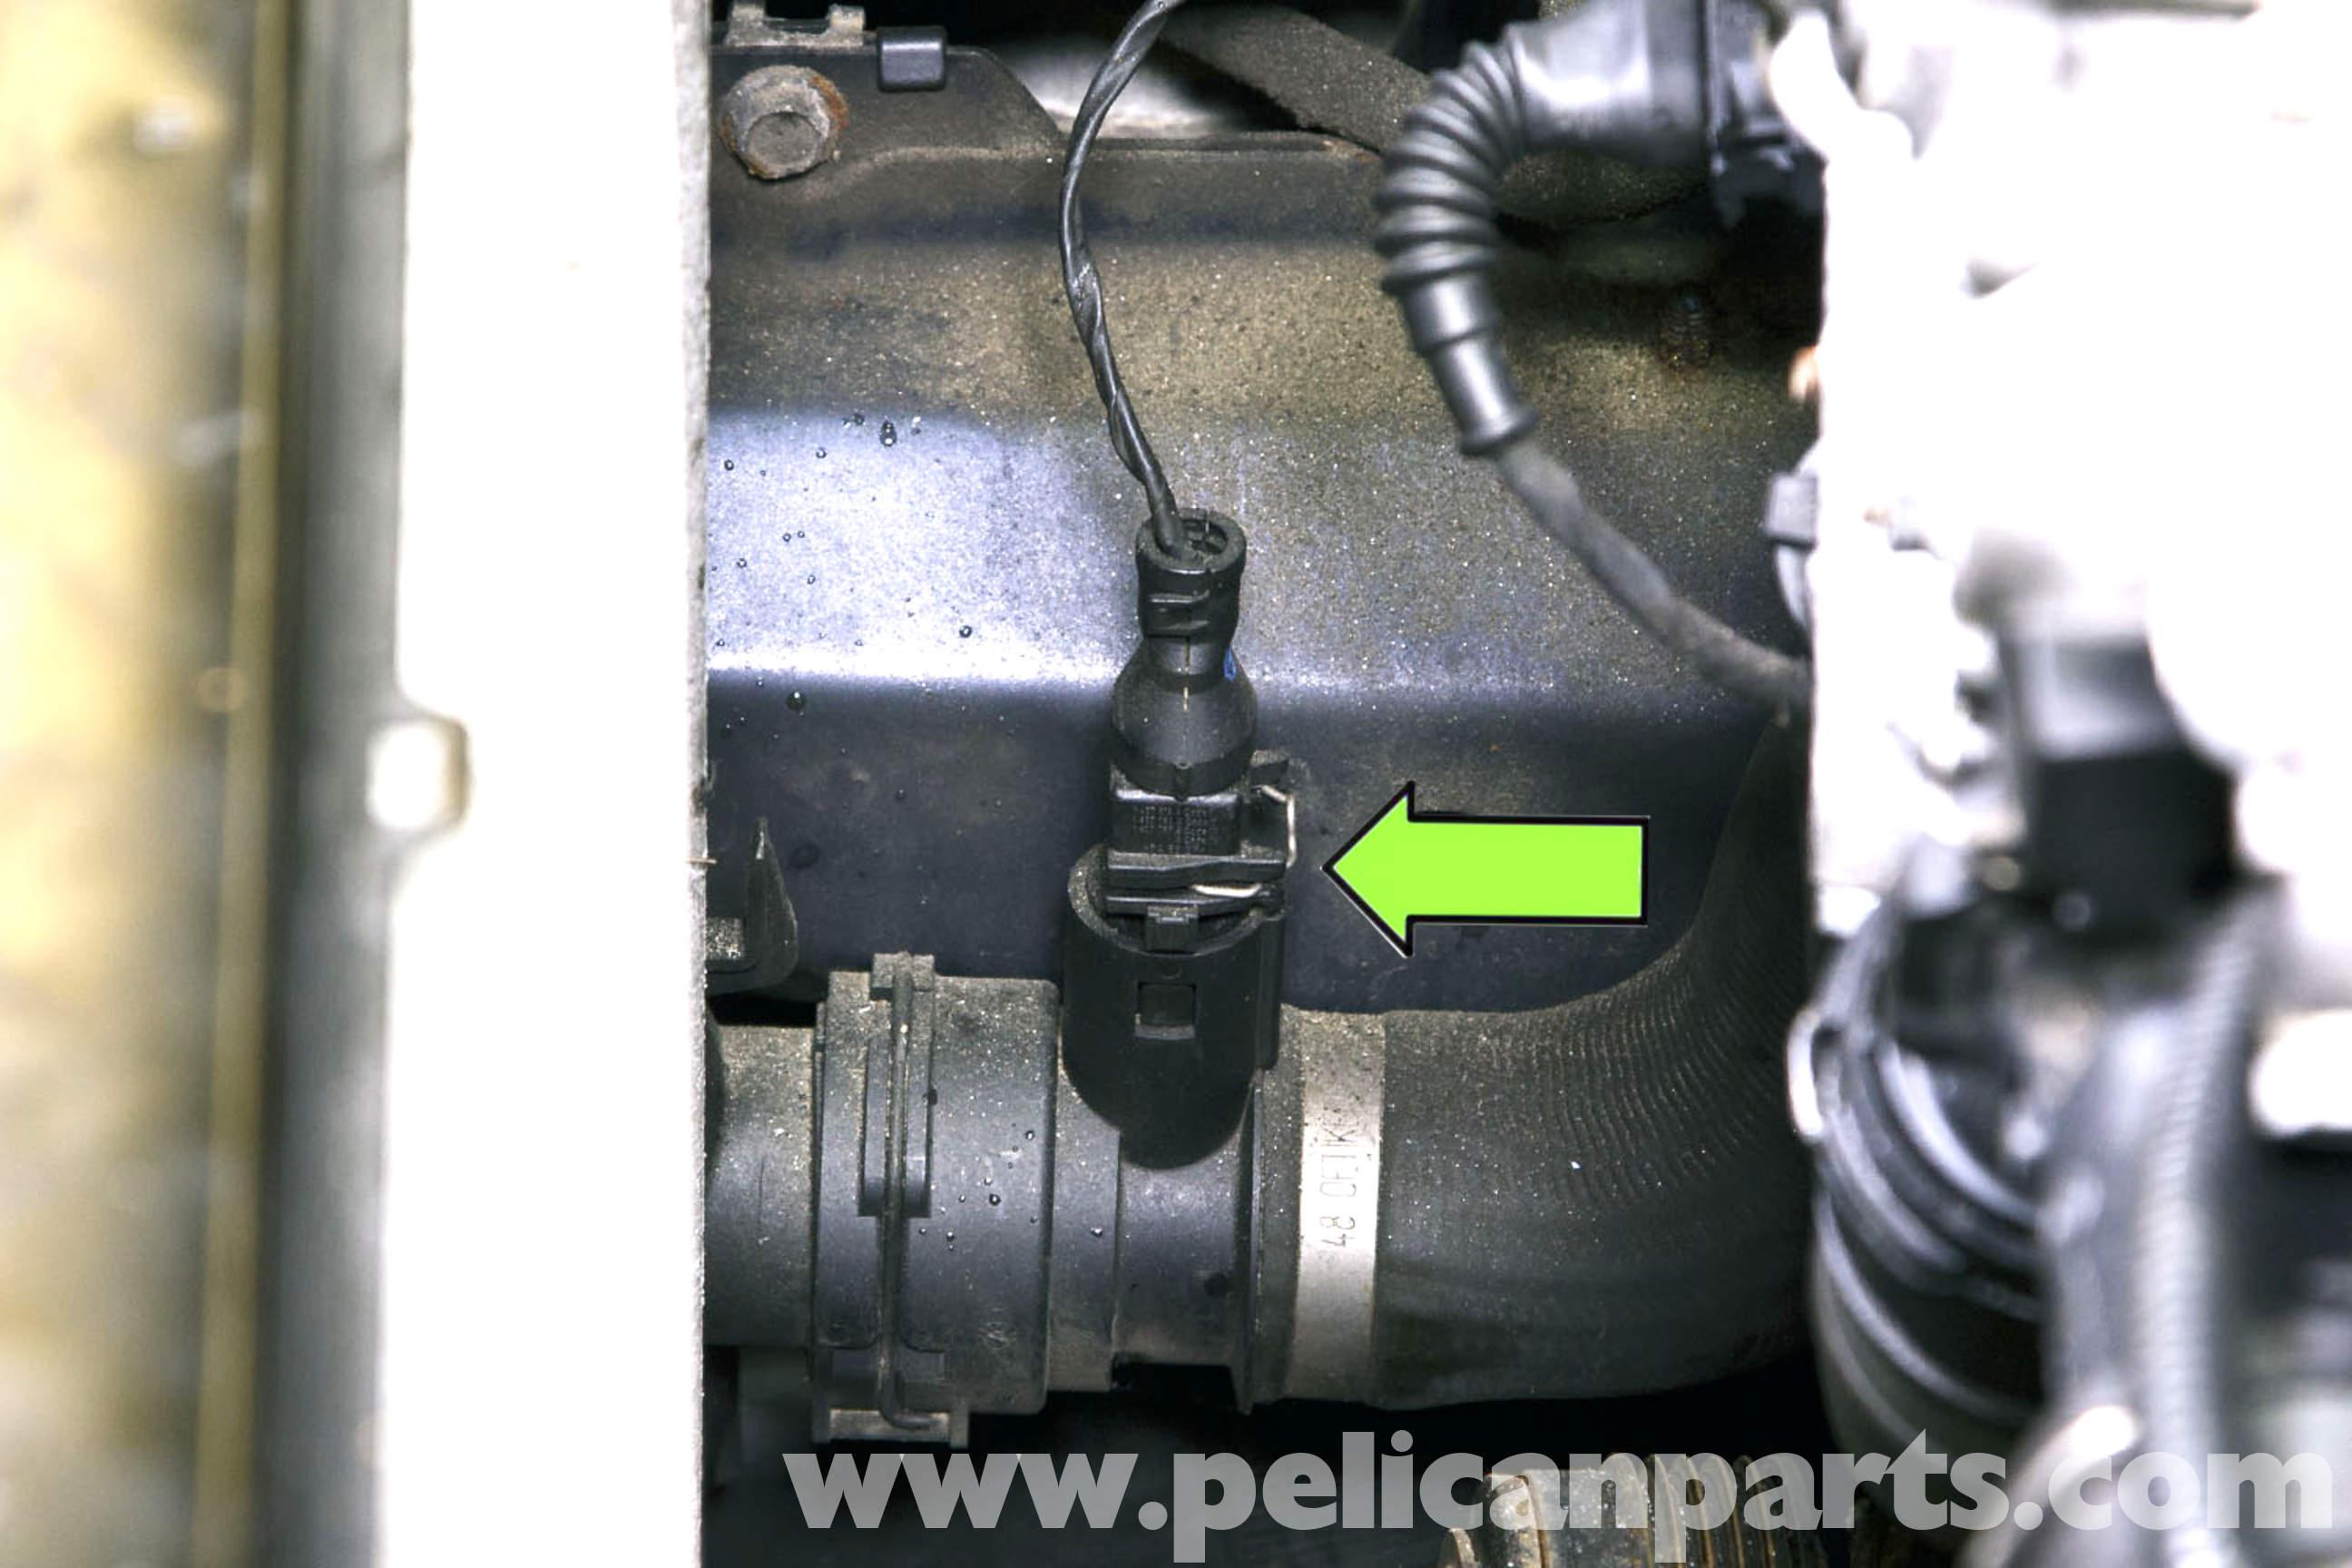 2006 Bmw X5 Wiring Schematics Bmw E46 Radiator Outlet Temperature Sensor Replacement